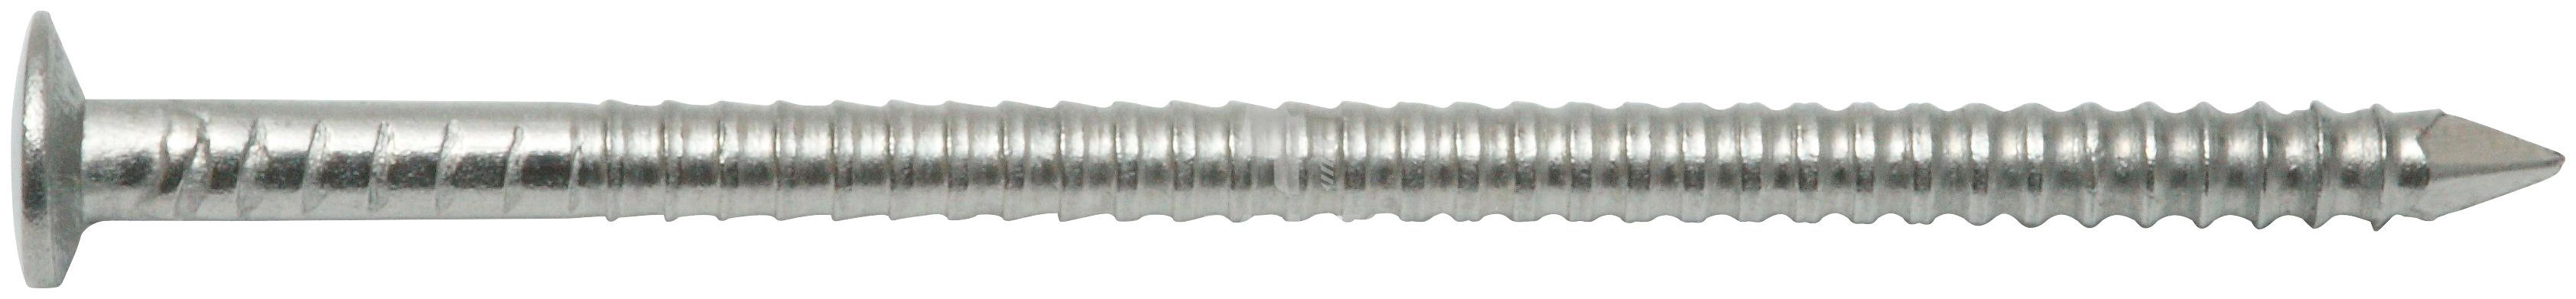 RAMSES Nagel , Linsenkopfnägel Senkkopf 2,3 x 45 mm Edelstahl A2, 250 Stk.